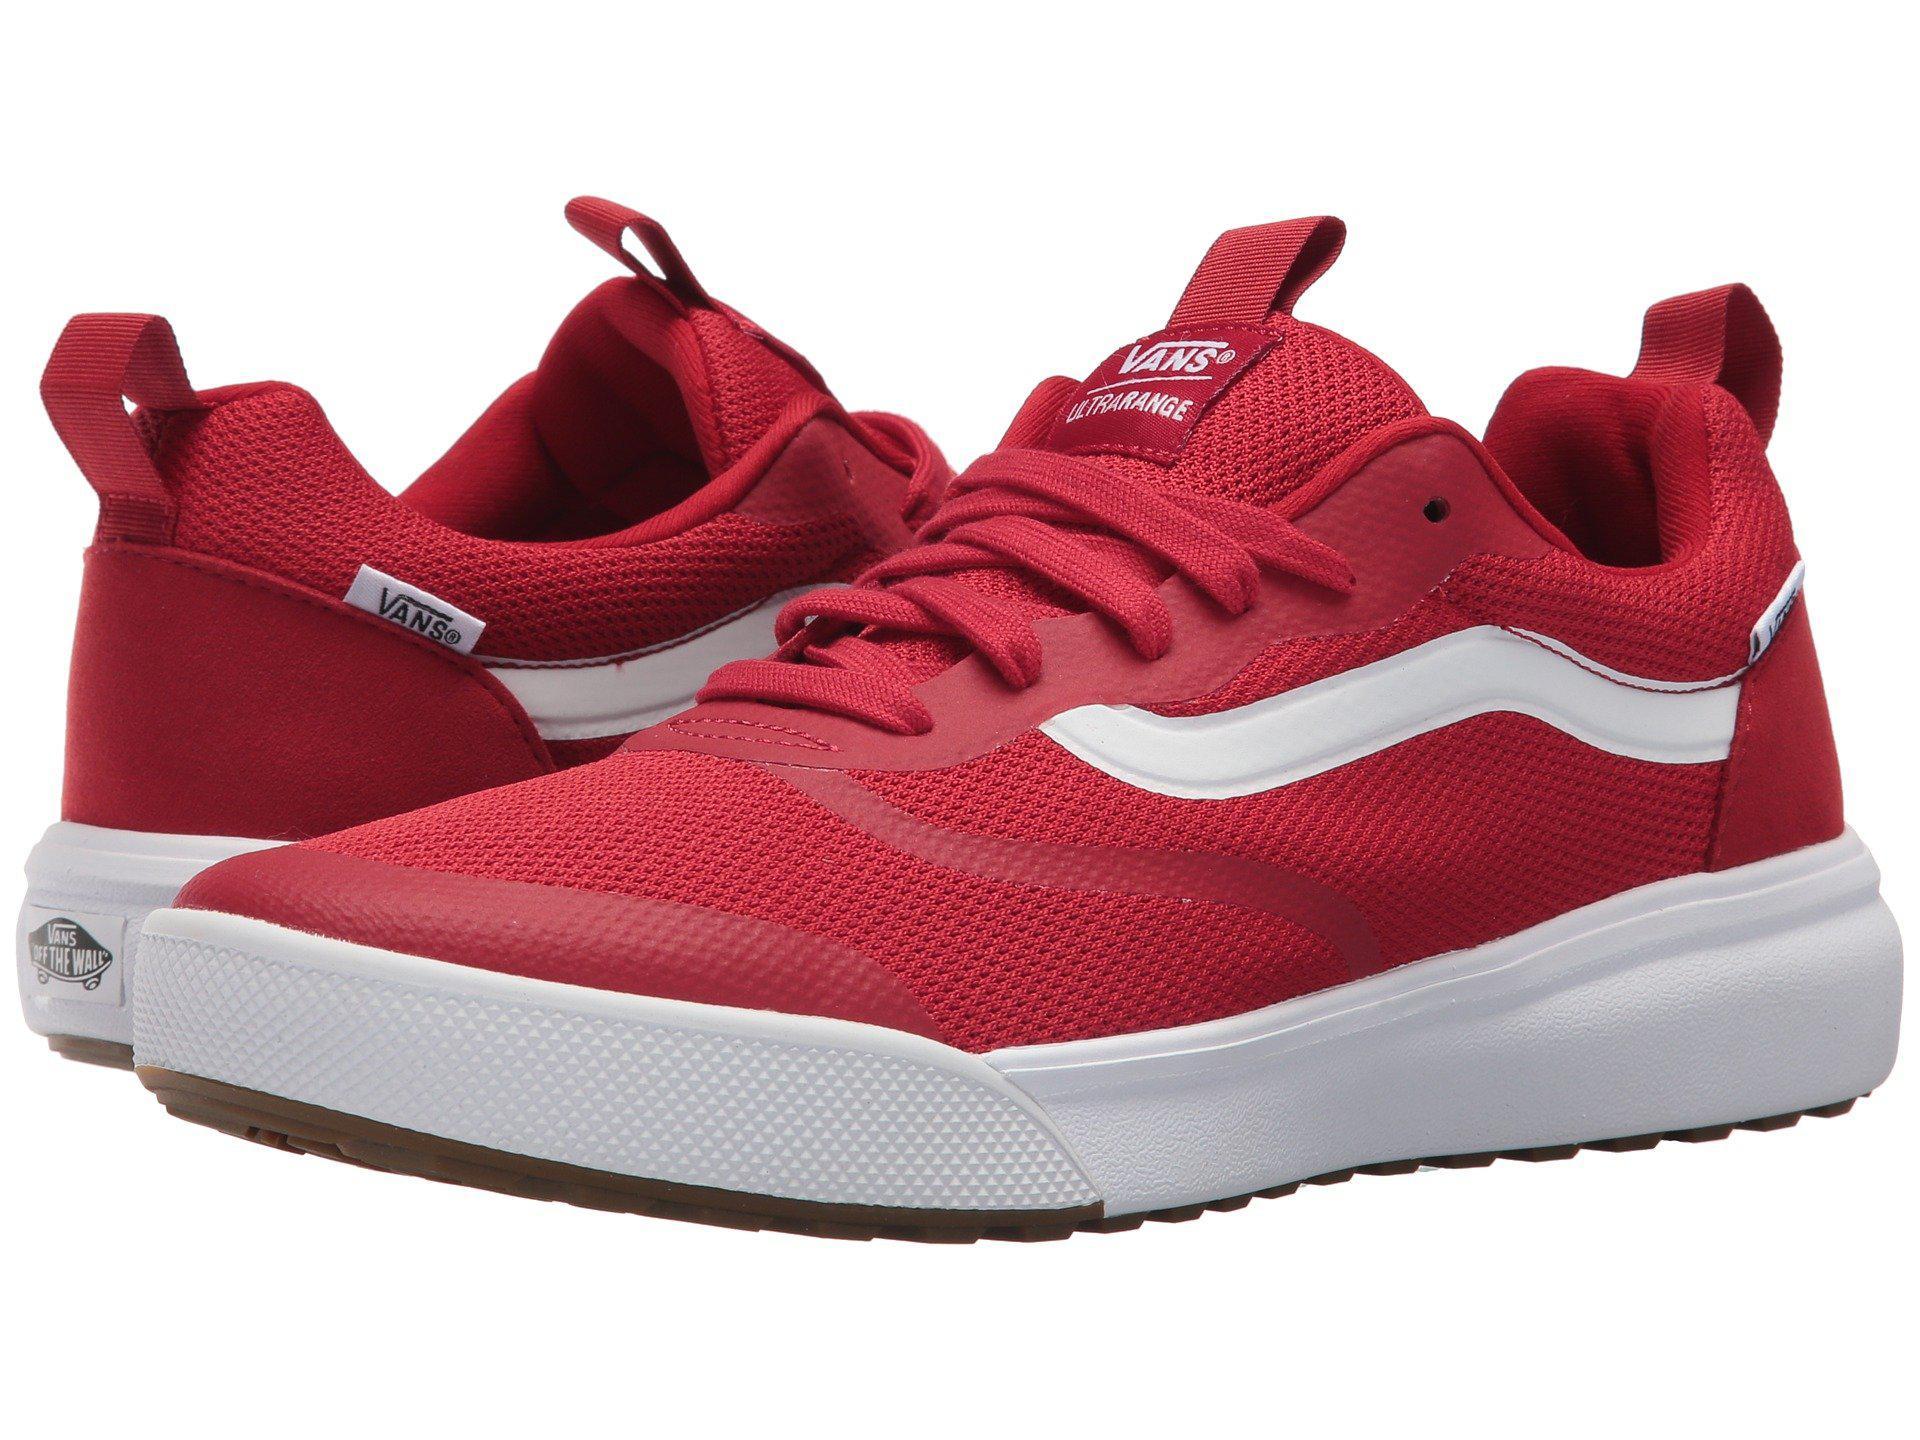 e3406b5c93 Lyst - Vans Ultrarange Rapidweld  18 (marshmallow) Skate Shoes in ...